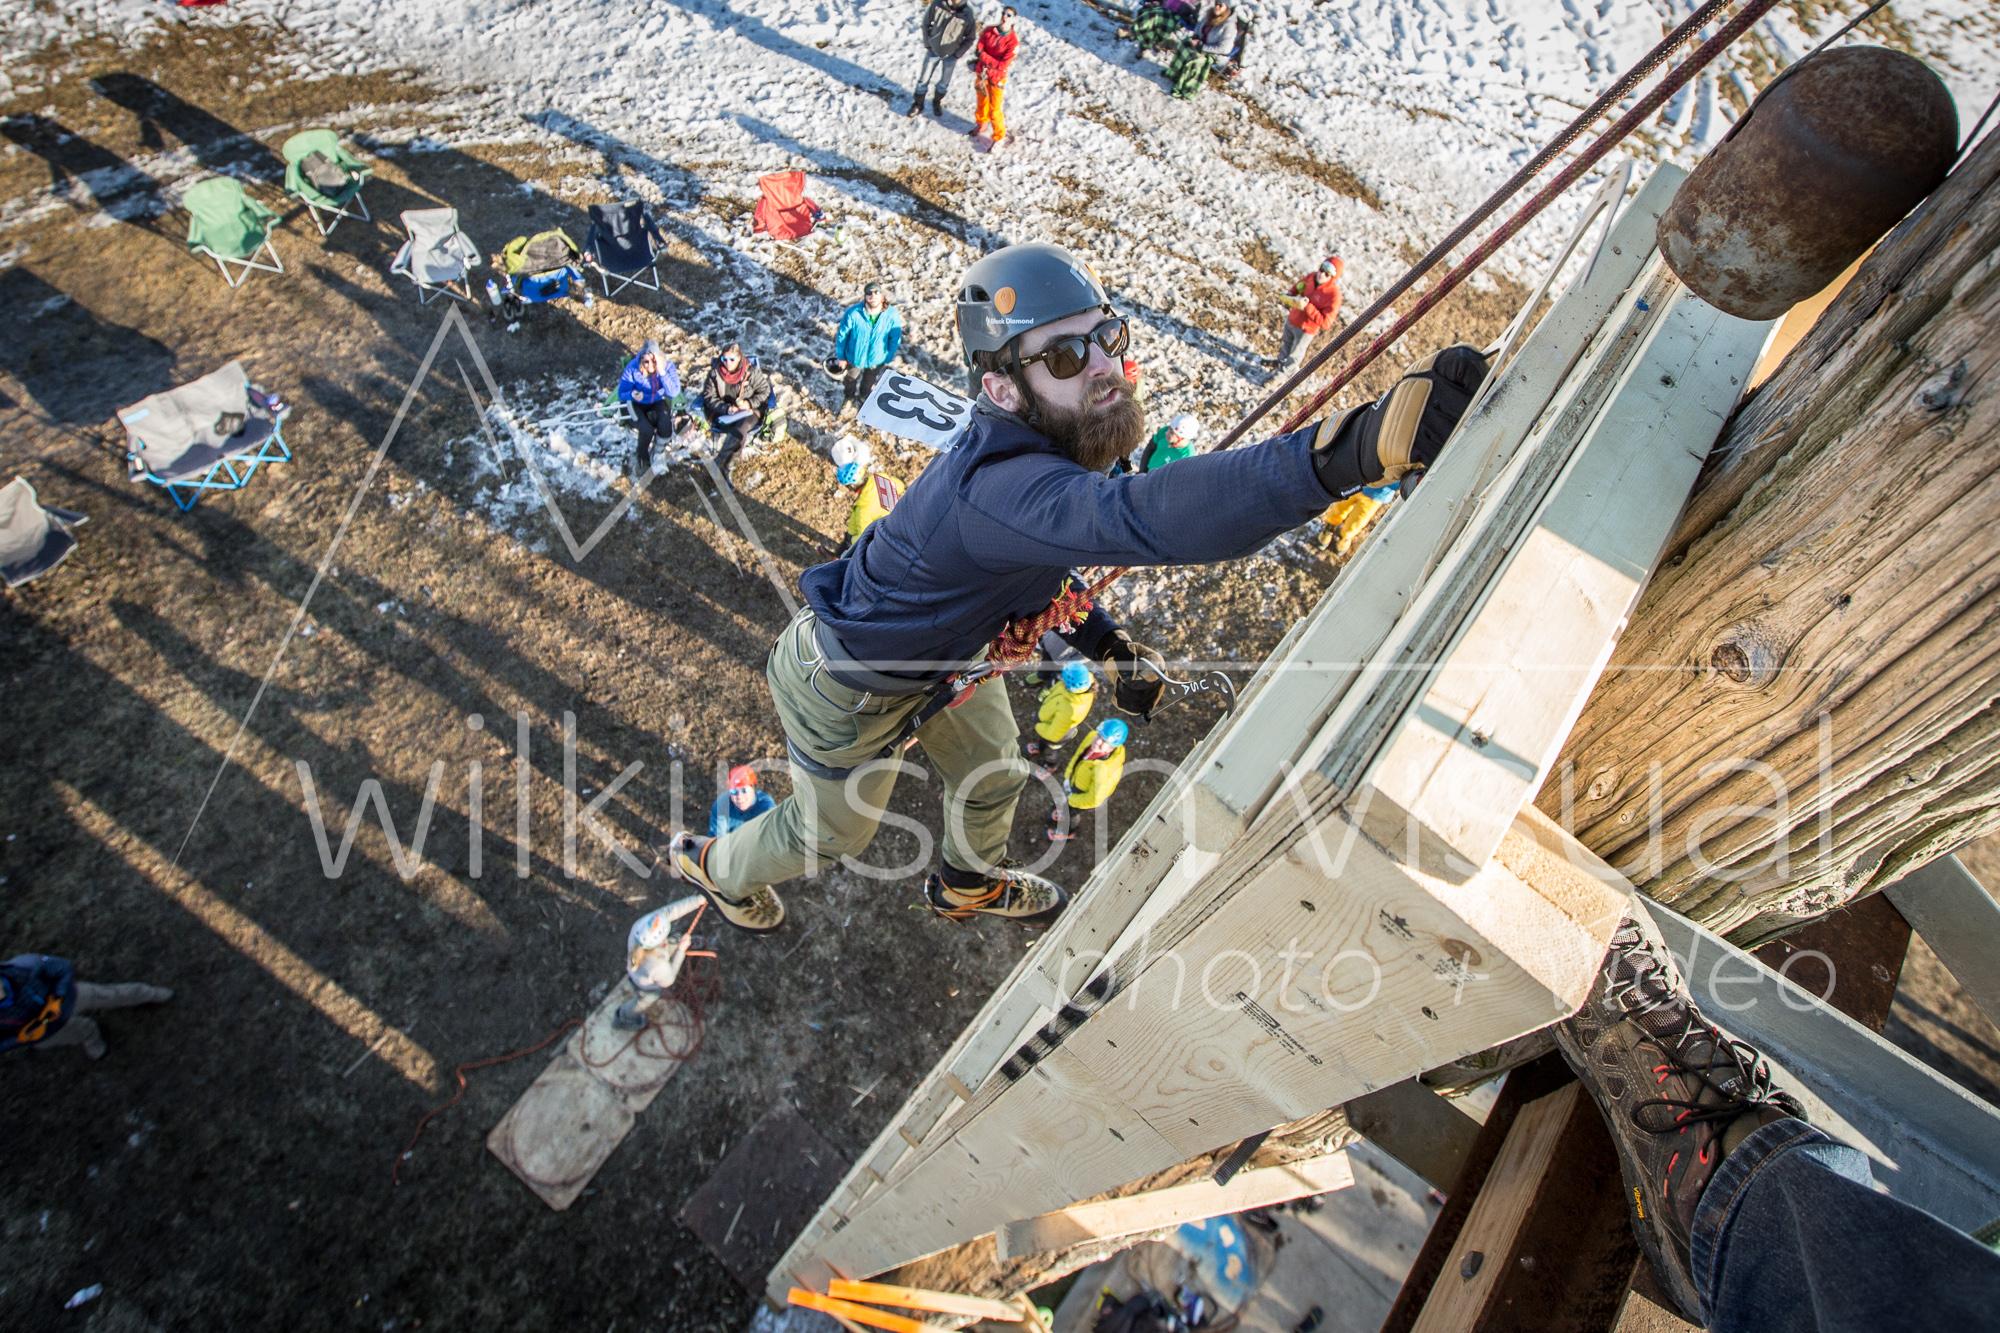 Photo by @wilkinsonvisual - www.wilkinsonvisual.com